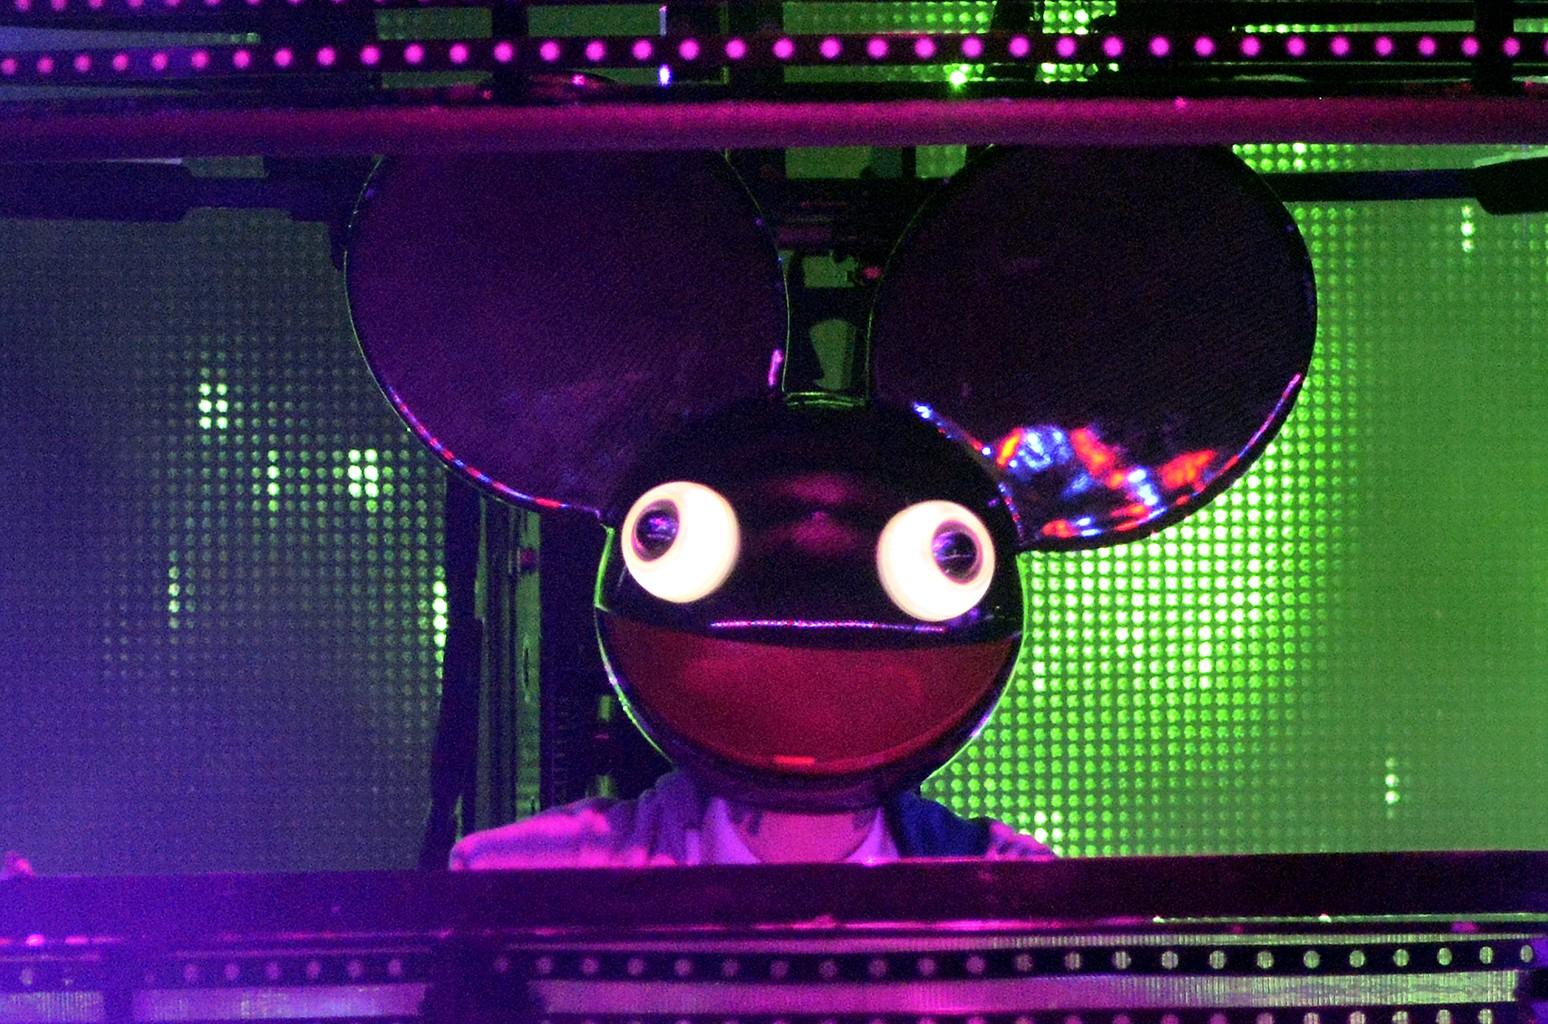 Deadmau5 performs in 2015